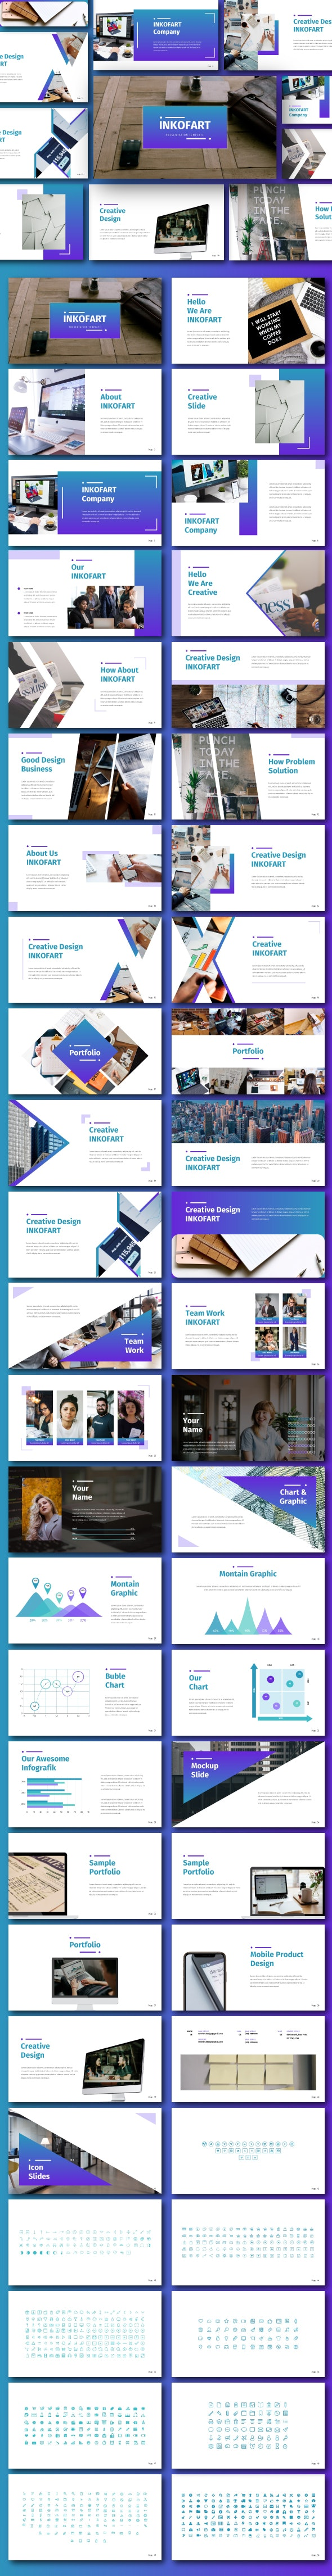 Inkofart - Business Powerpoint Template - Business PowerPoint Templates